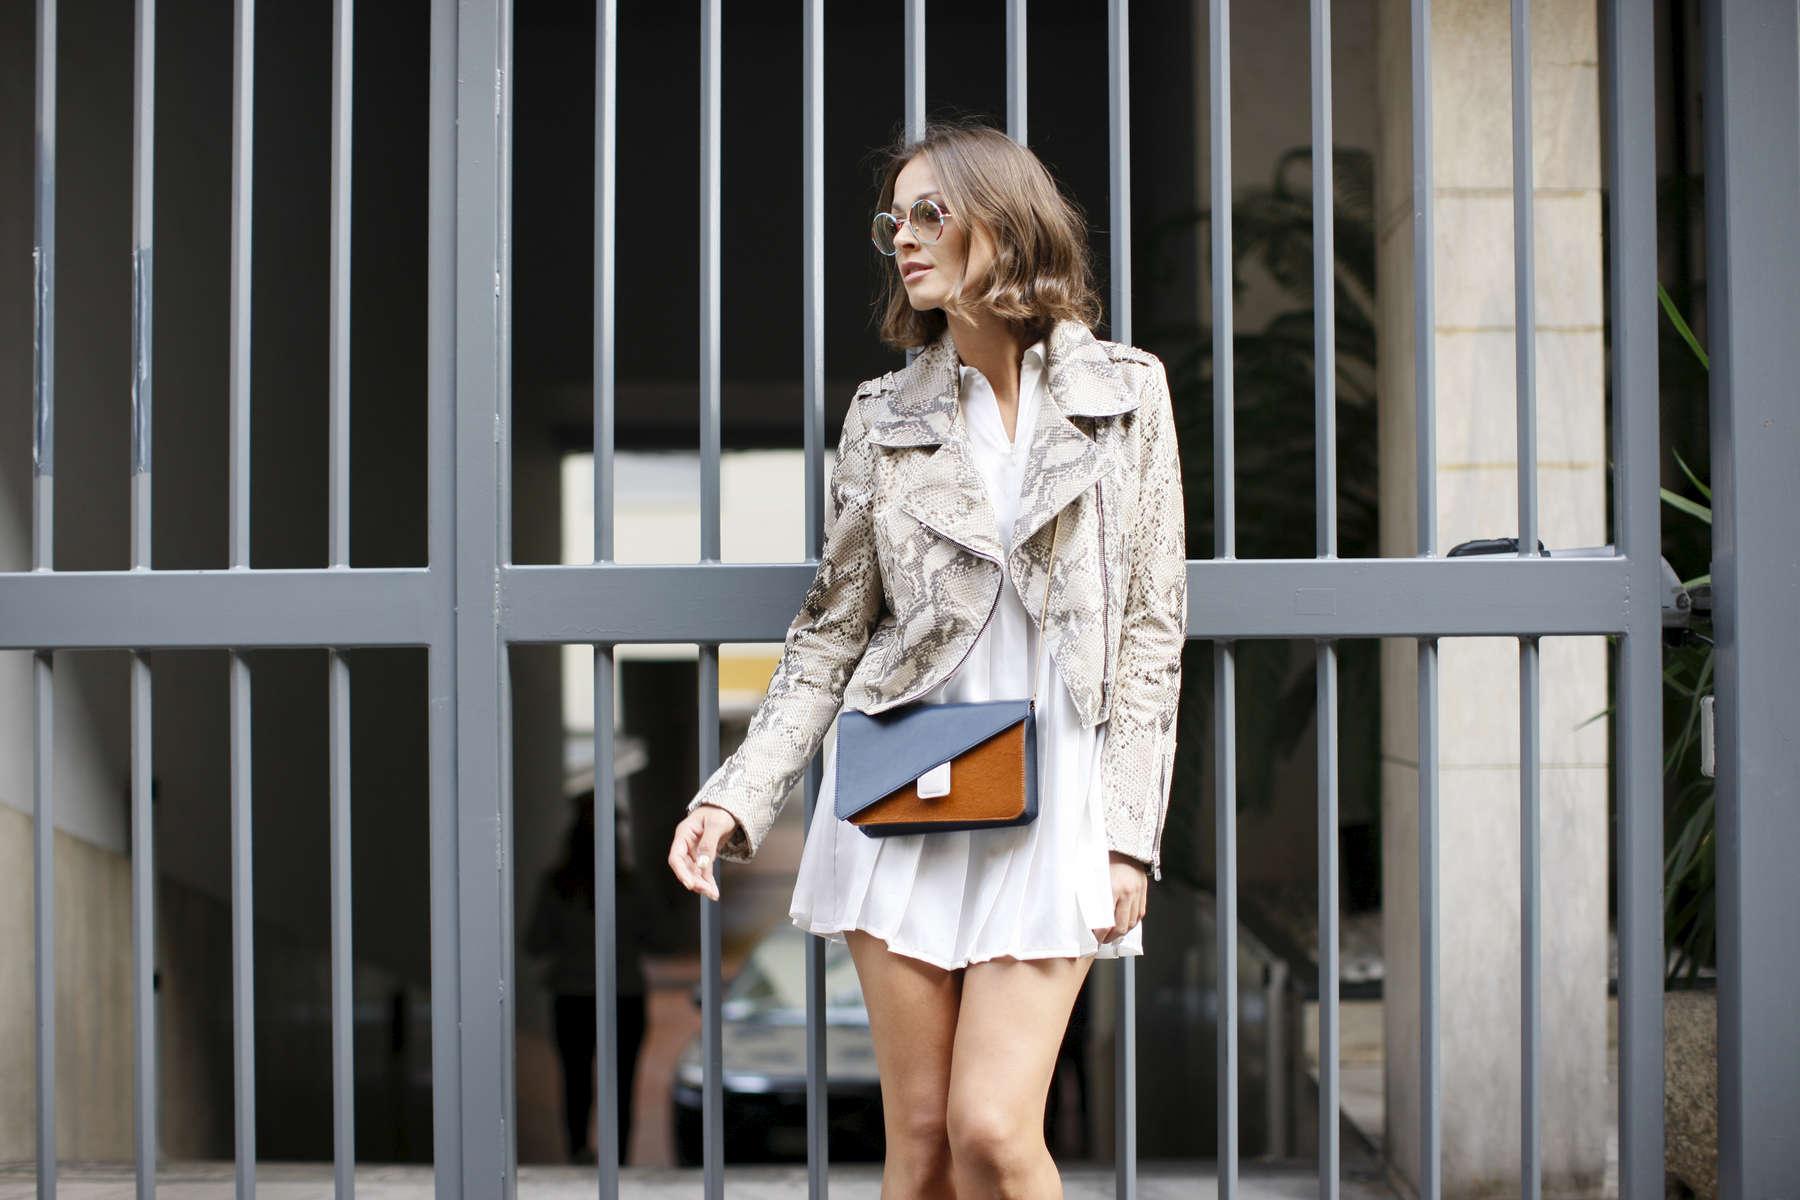 Kasia Borowicz - Milan Fashion Week, Sept. 2015